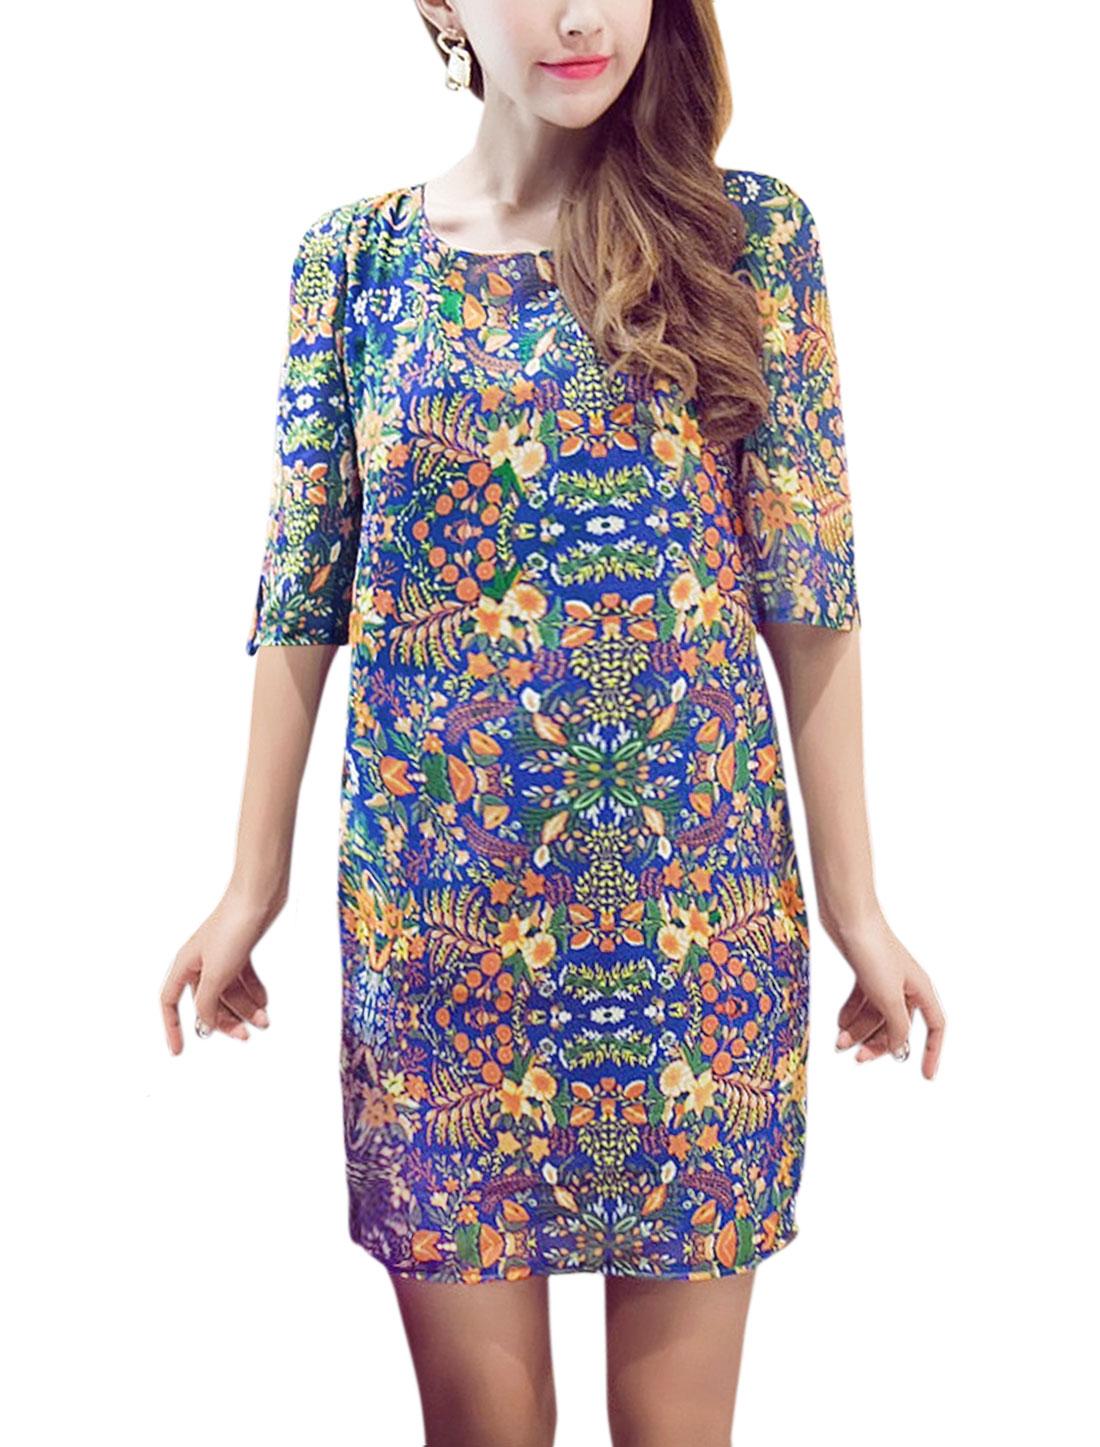 Women Elbow Sleeves Split Cuffs Floral Prints Chiffon Sheath Dress Blue L